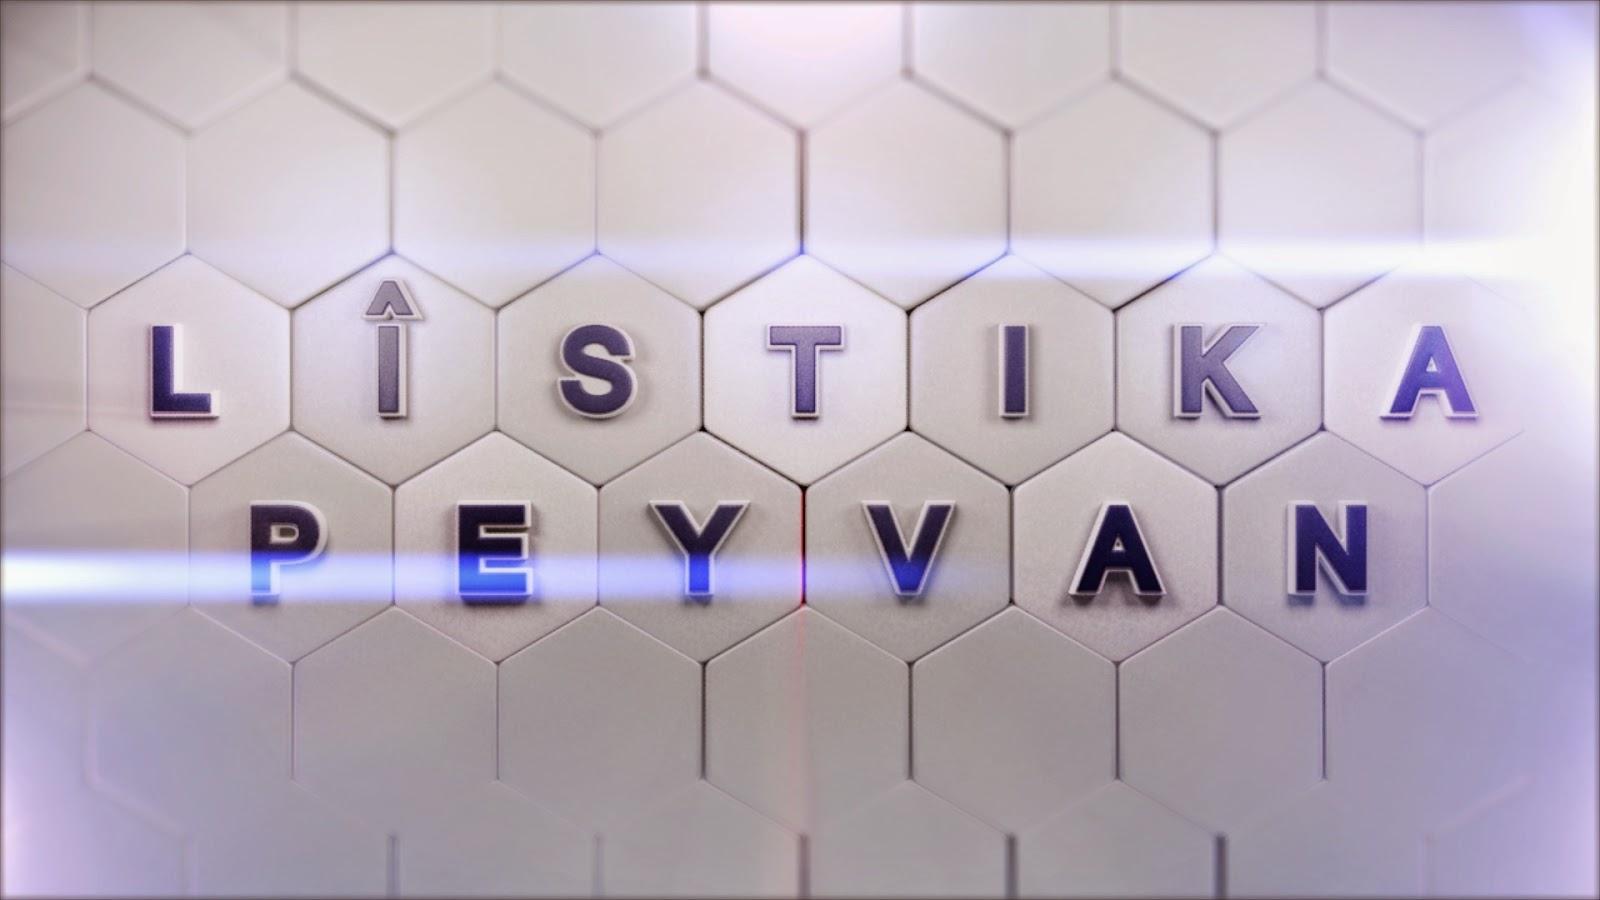 Listika Peyvan Rexnegire Televizyonen Kurdi Kurt Televizyonlari Elestirmeni